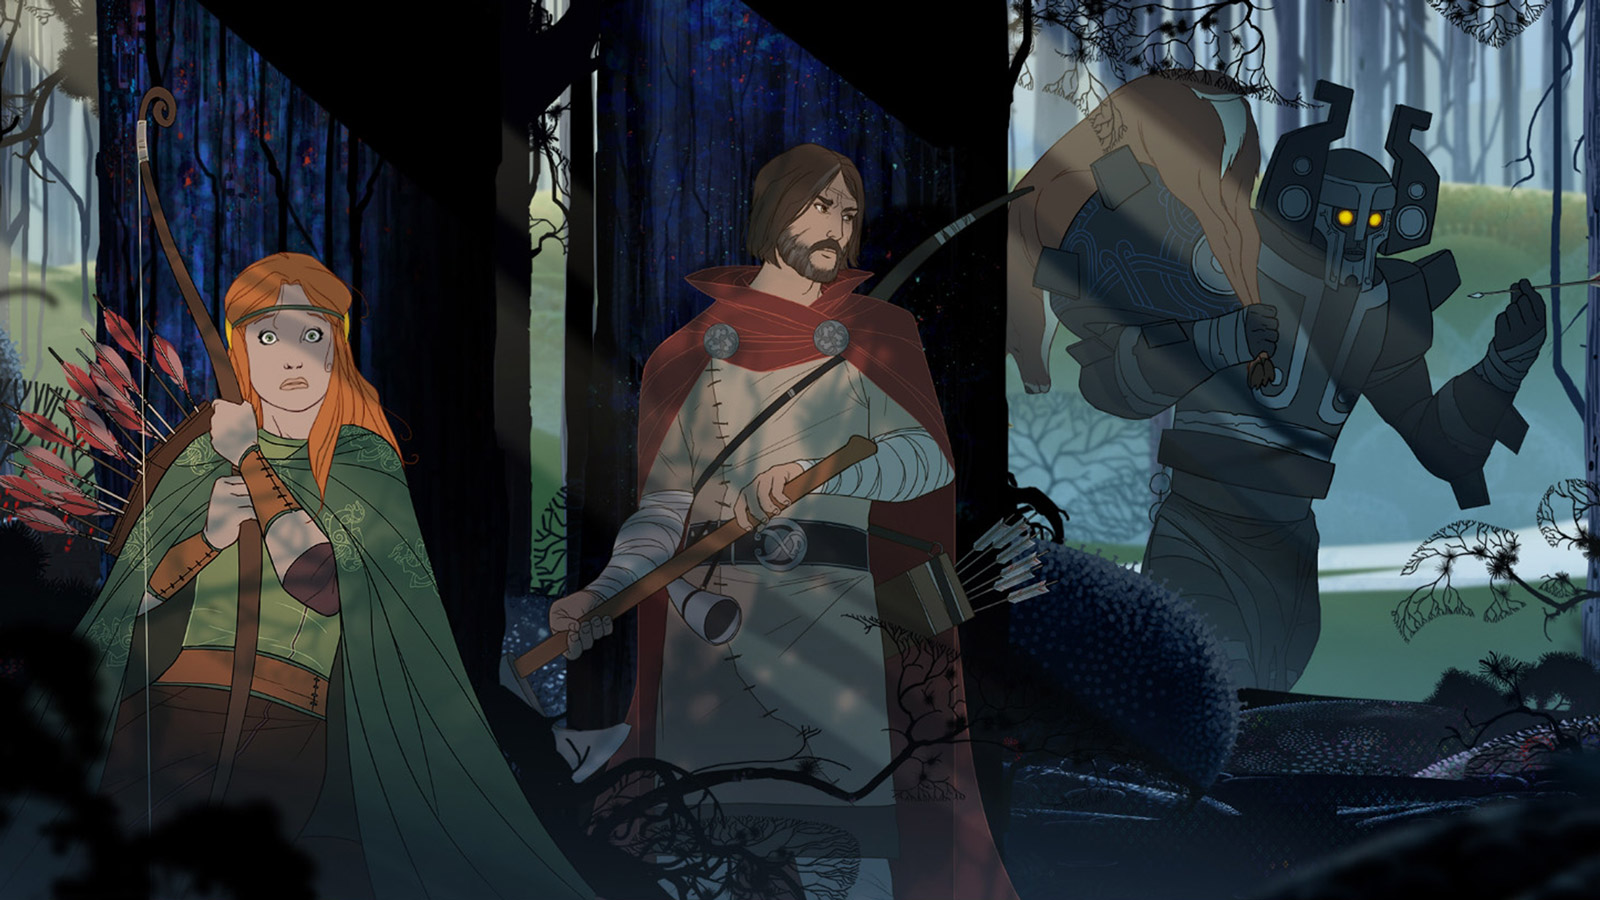 The Banner Saga Wallpaper in 1600x900 1600x900